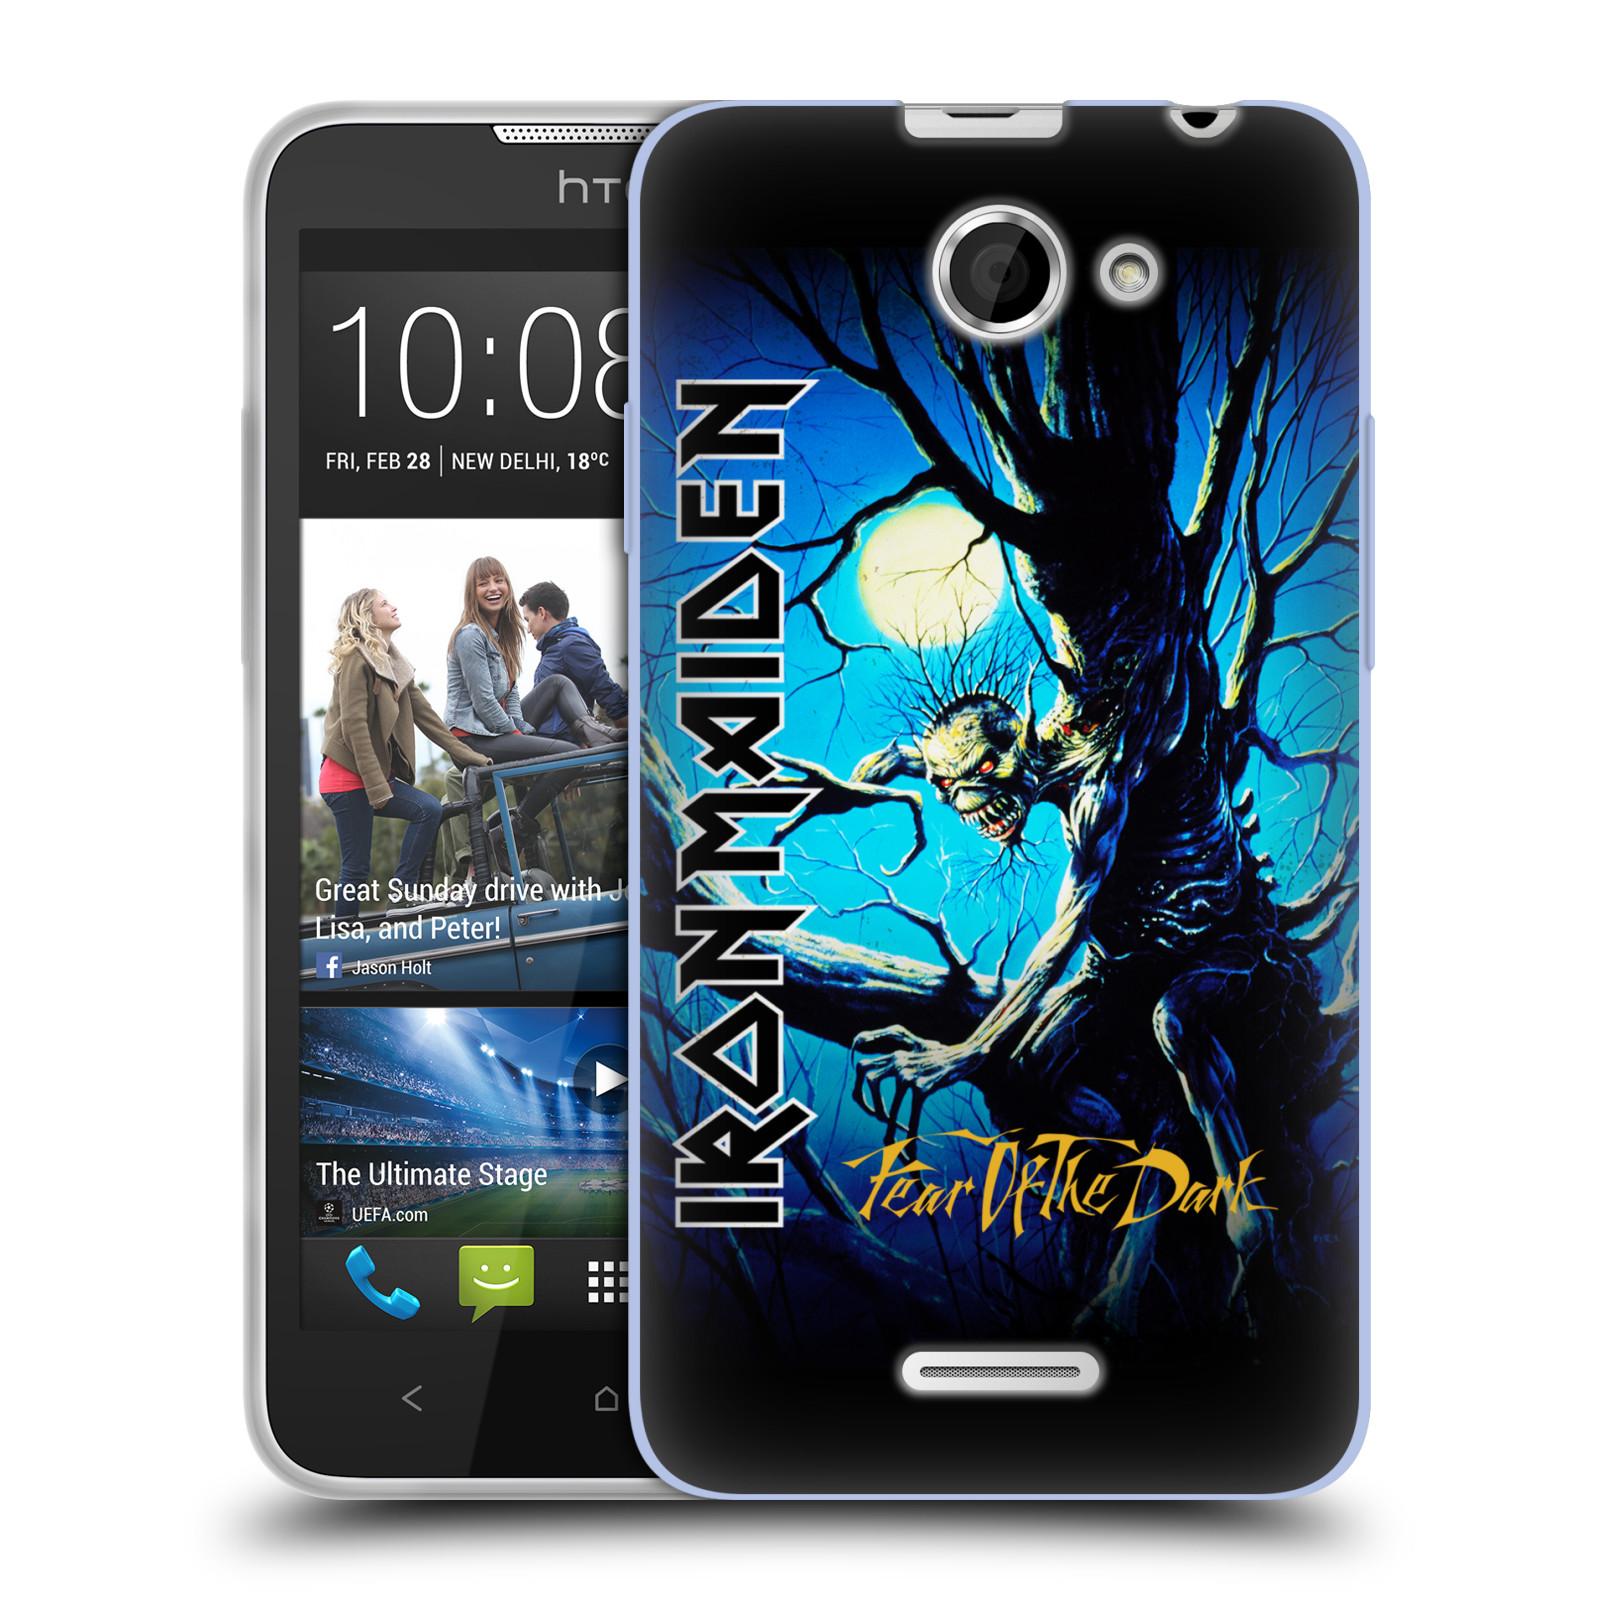 Silikonové pouzdro na mobil HTC Desire 516 HEAD CASE - Iron Maiden - Fear Of The Dark (Silikonový kryt či obal na mobilní telefon s licencovaným motivem Iron Maiden HTC Desire 516 Dual SIM)